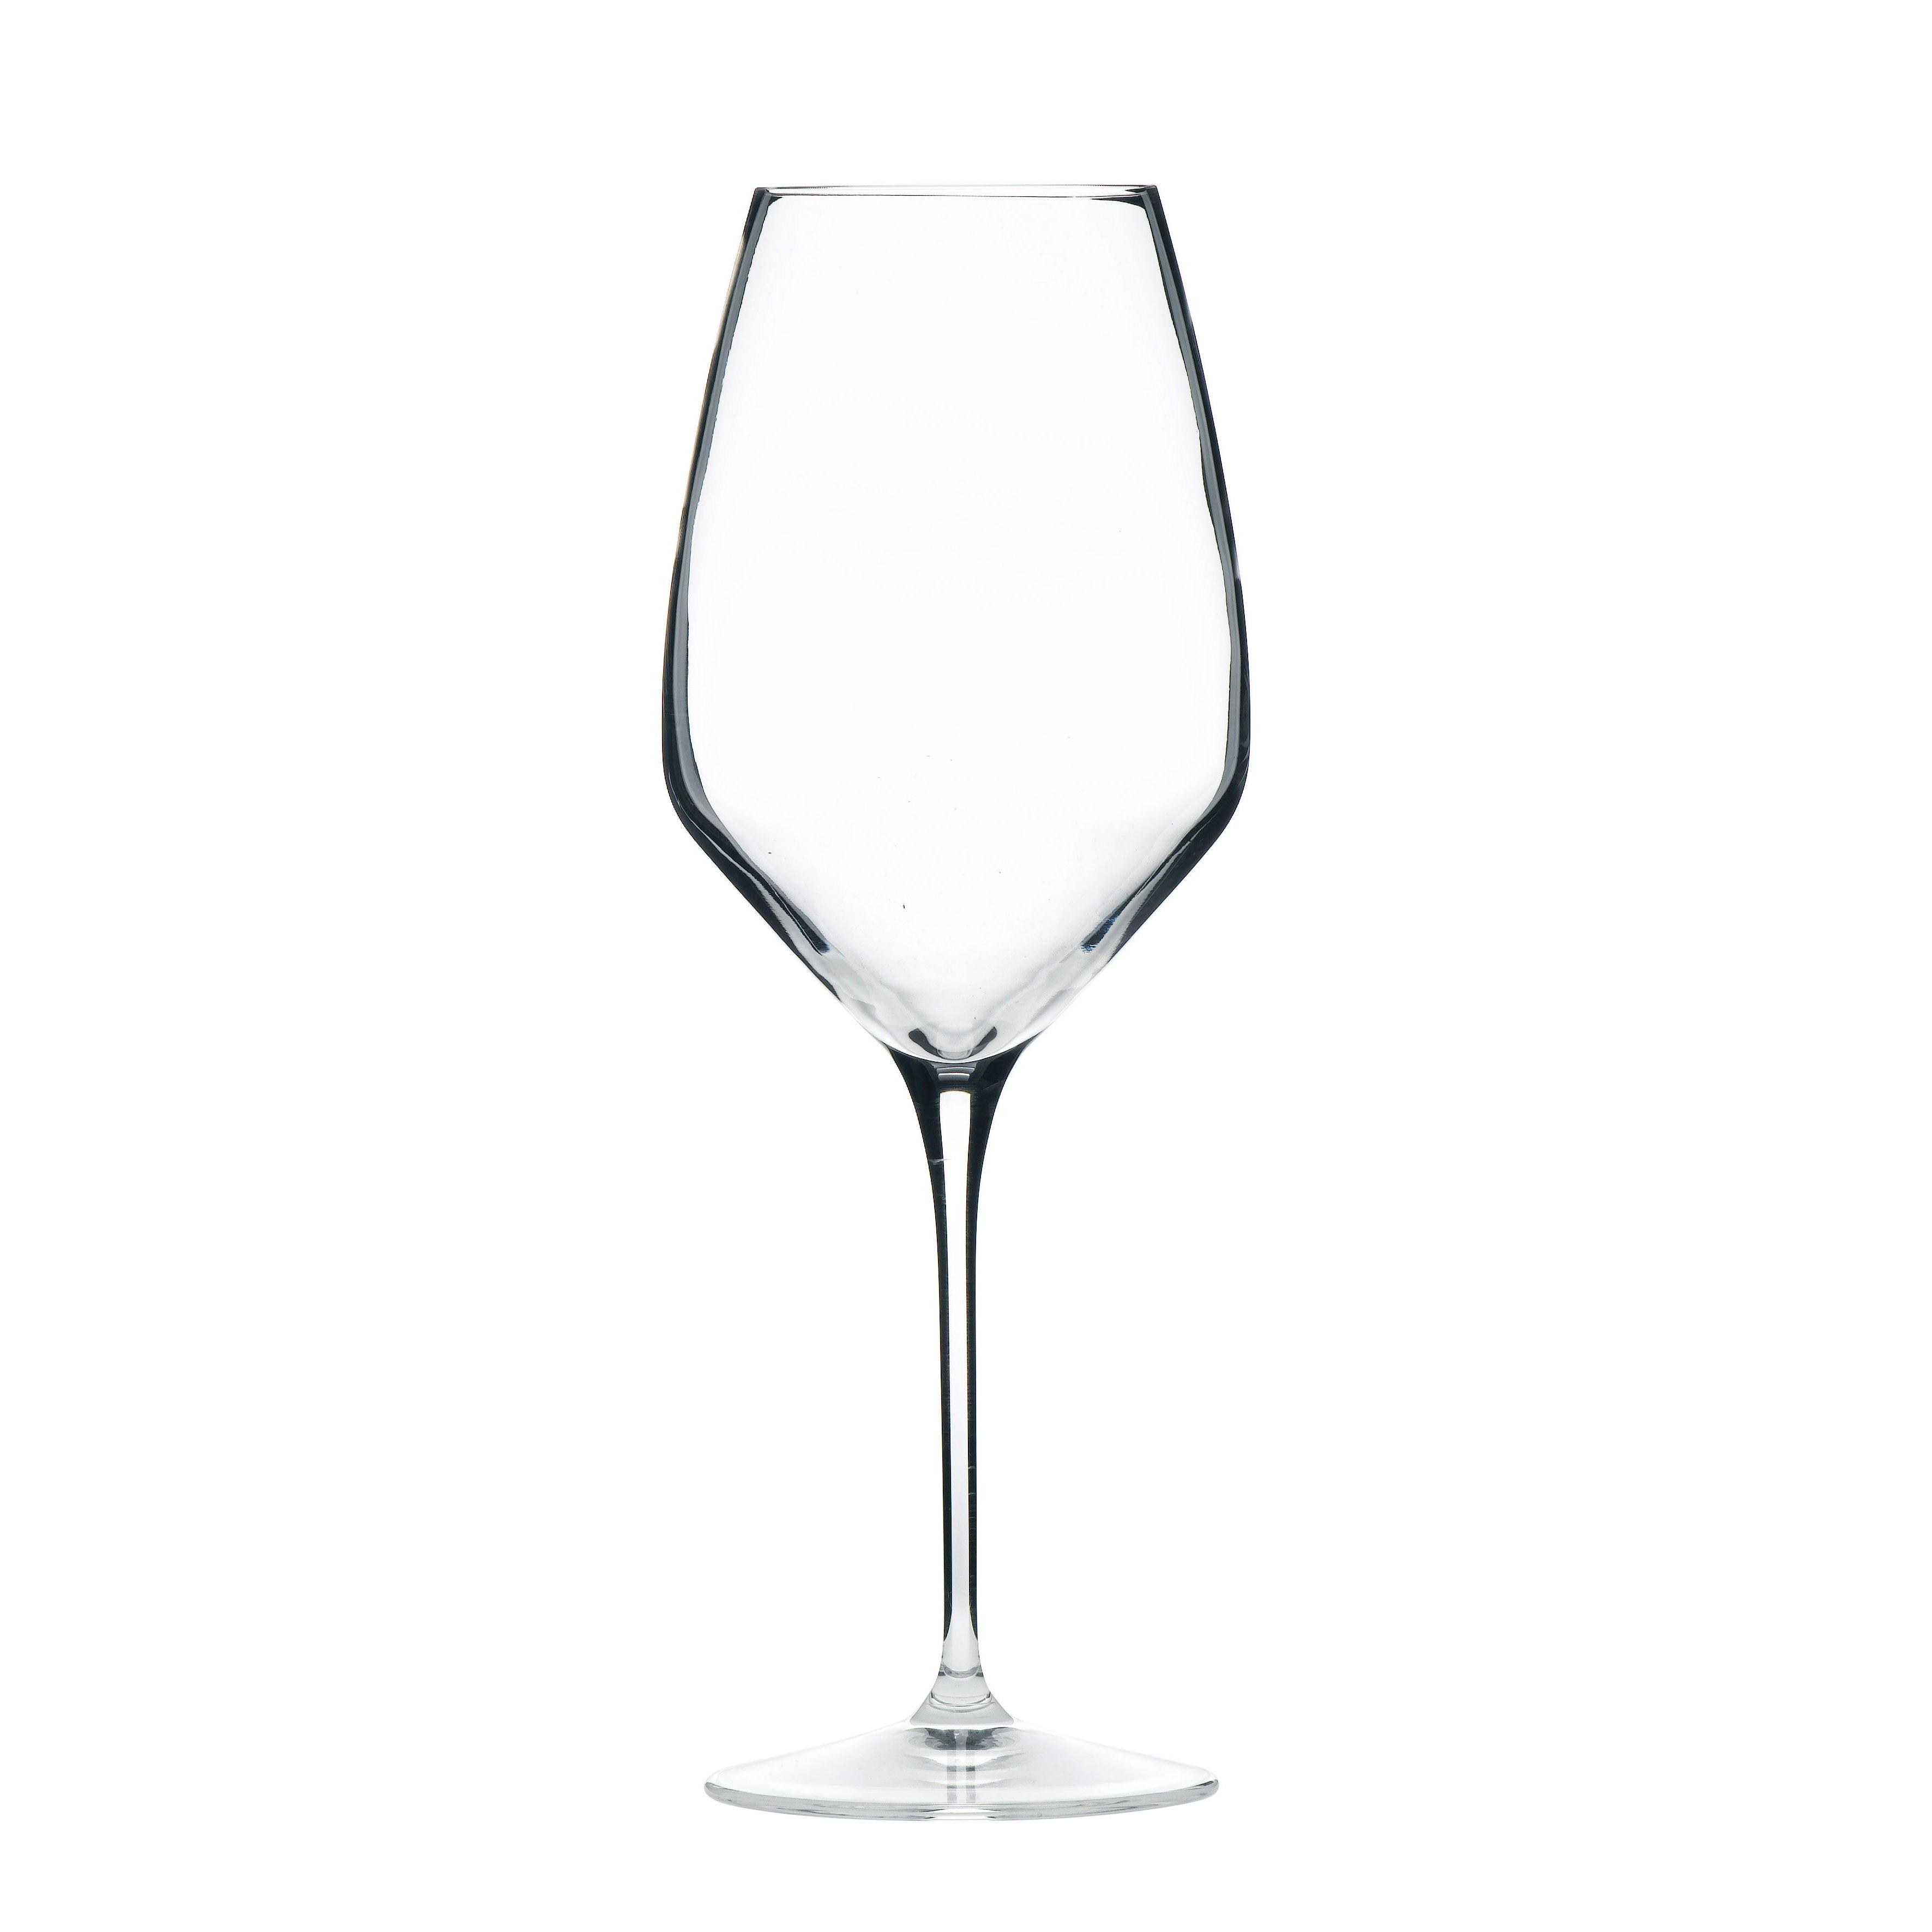 Atelier White Wine Glasses 44cl 15.5oz